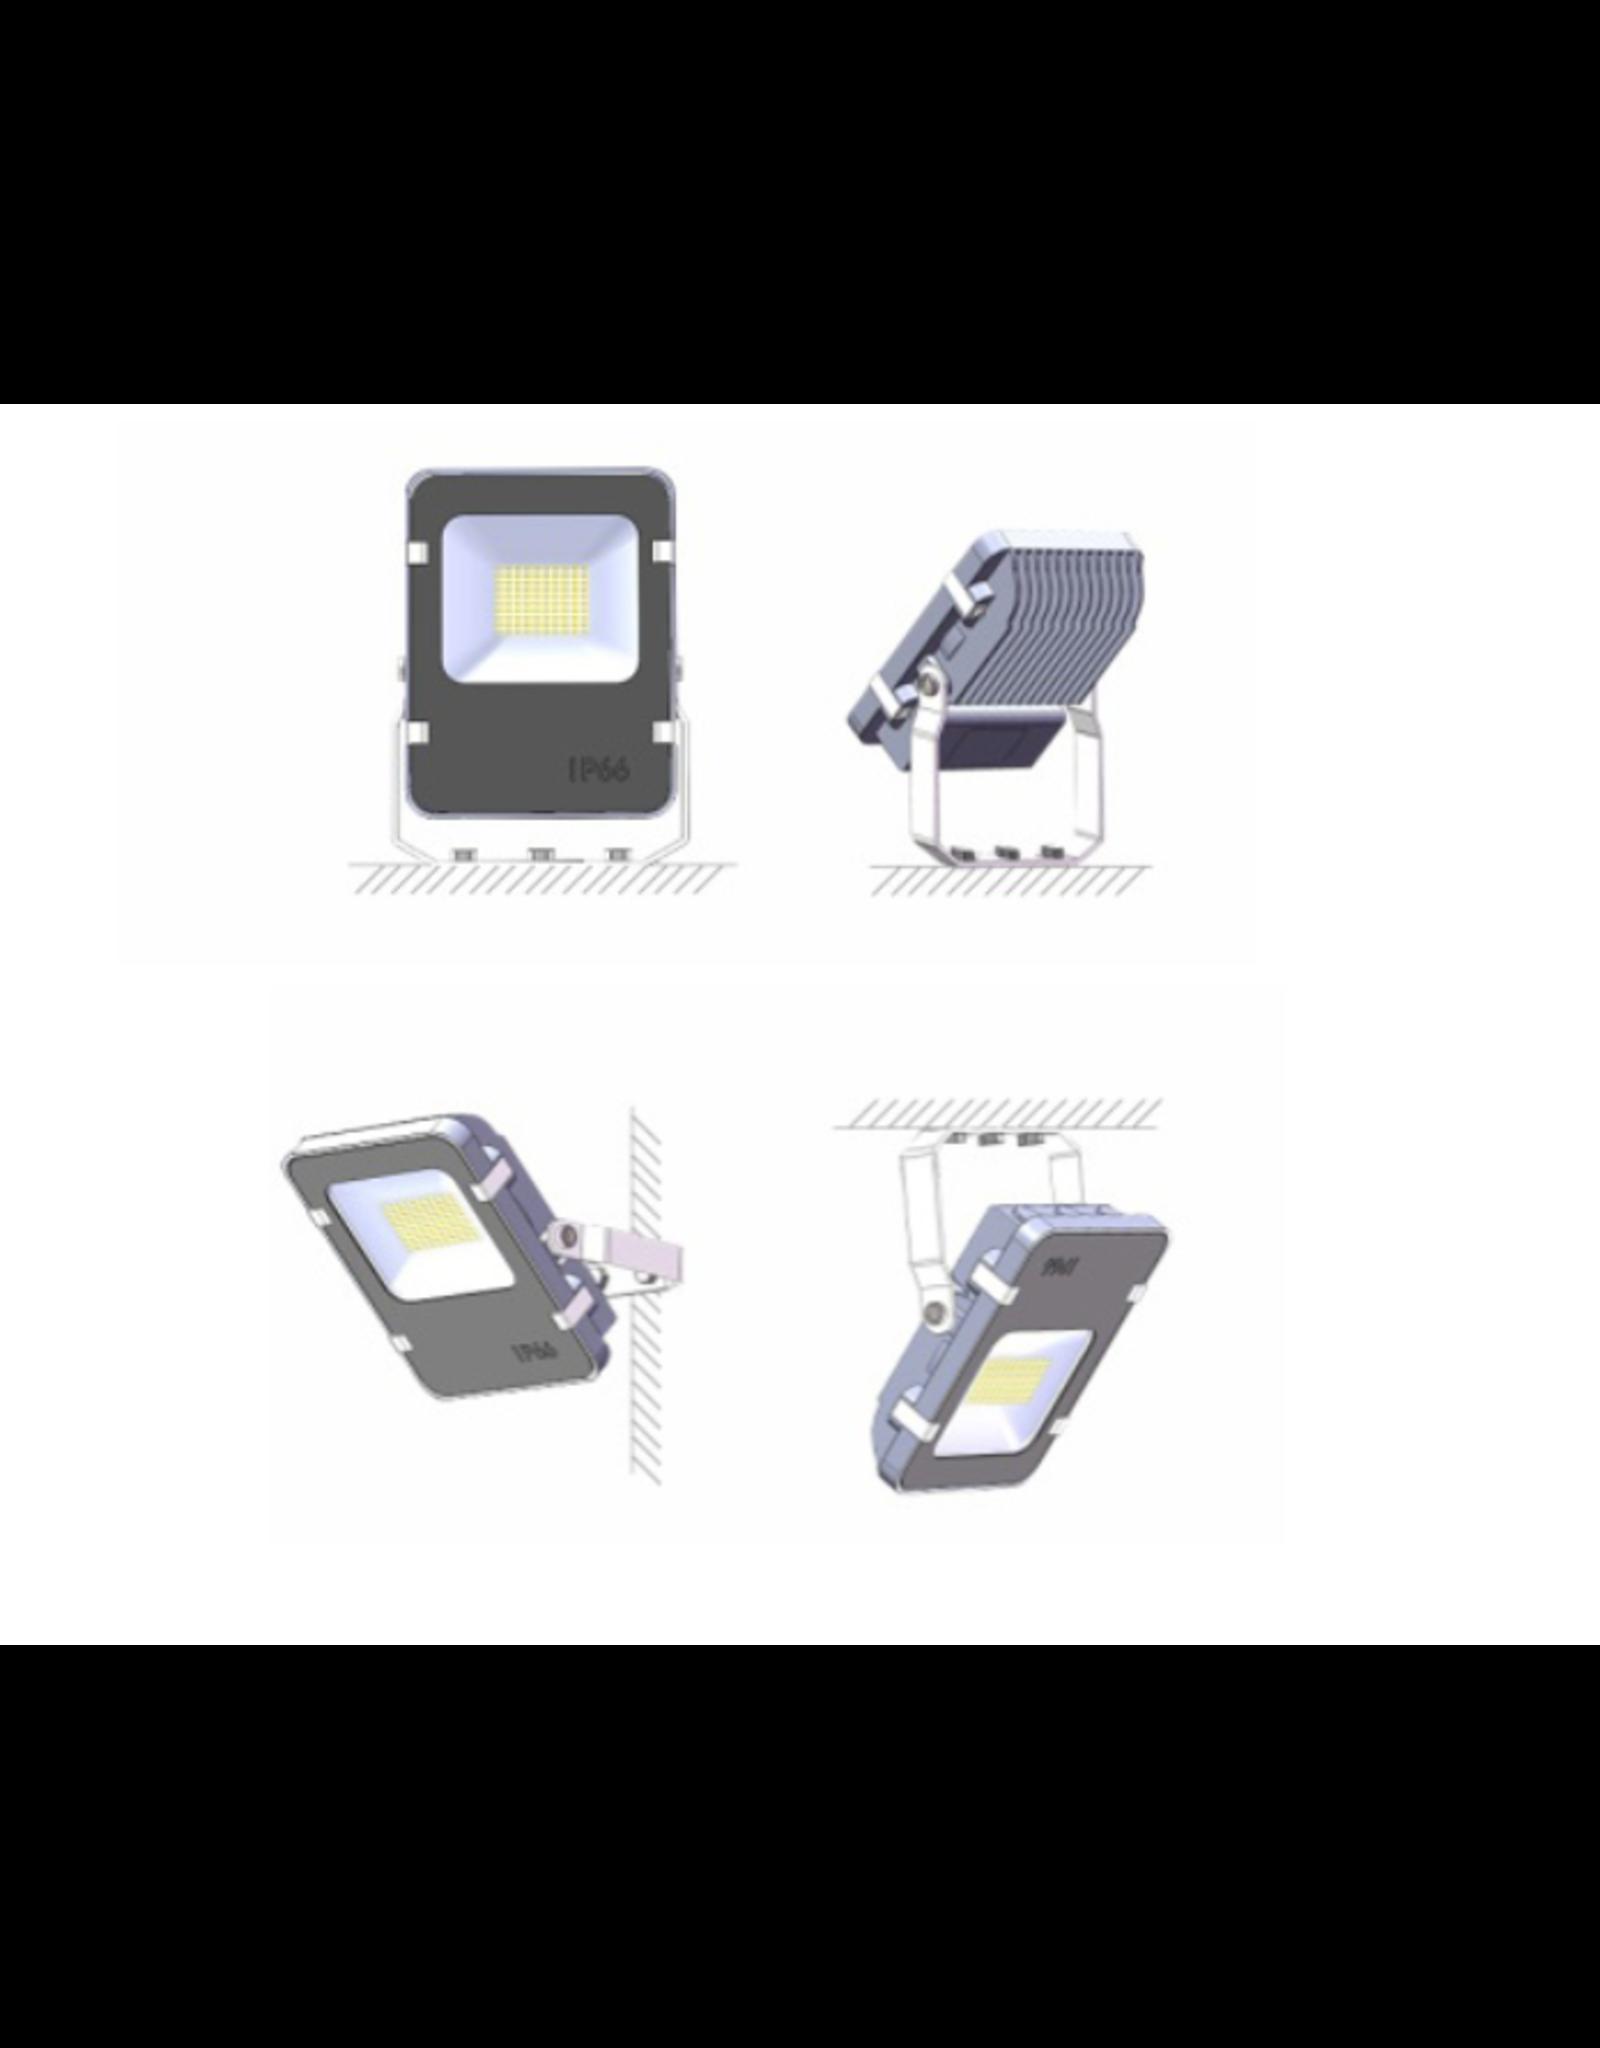 LedLed LED Swelo Schijnwerper IP66 120W